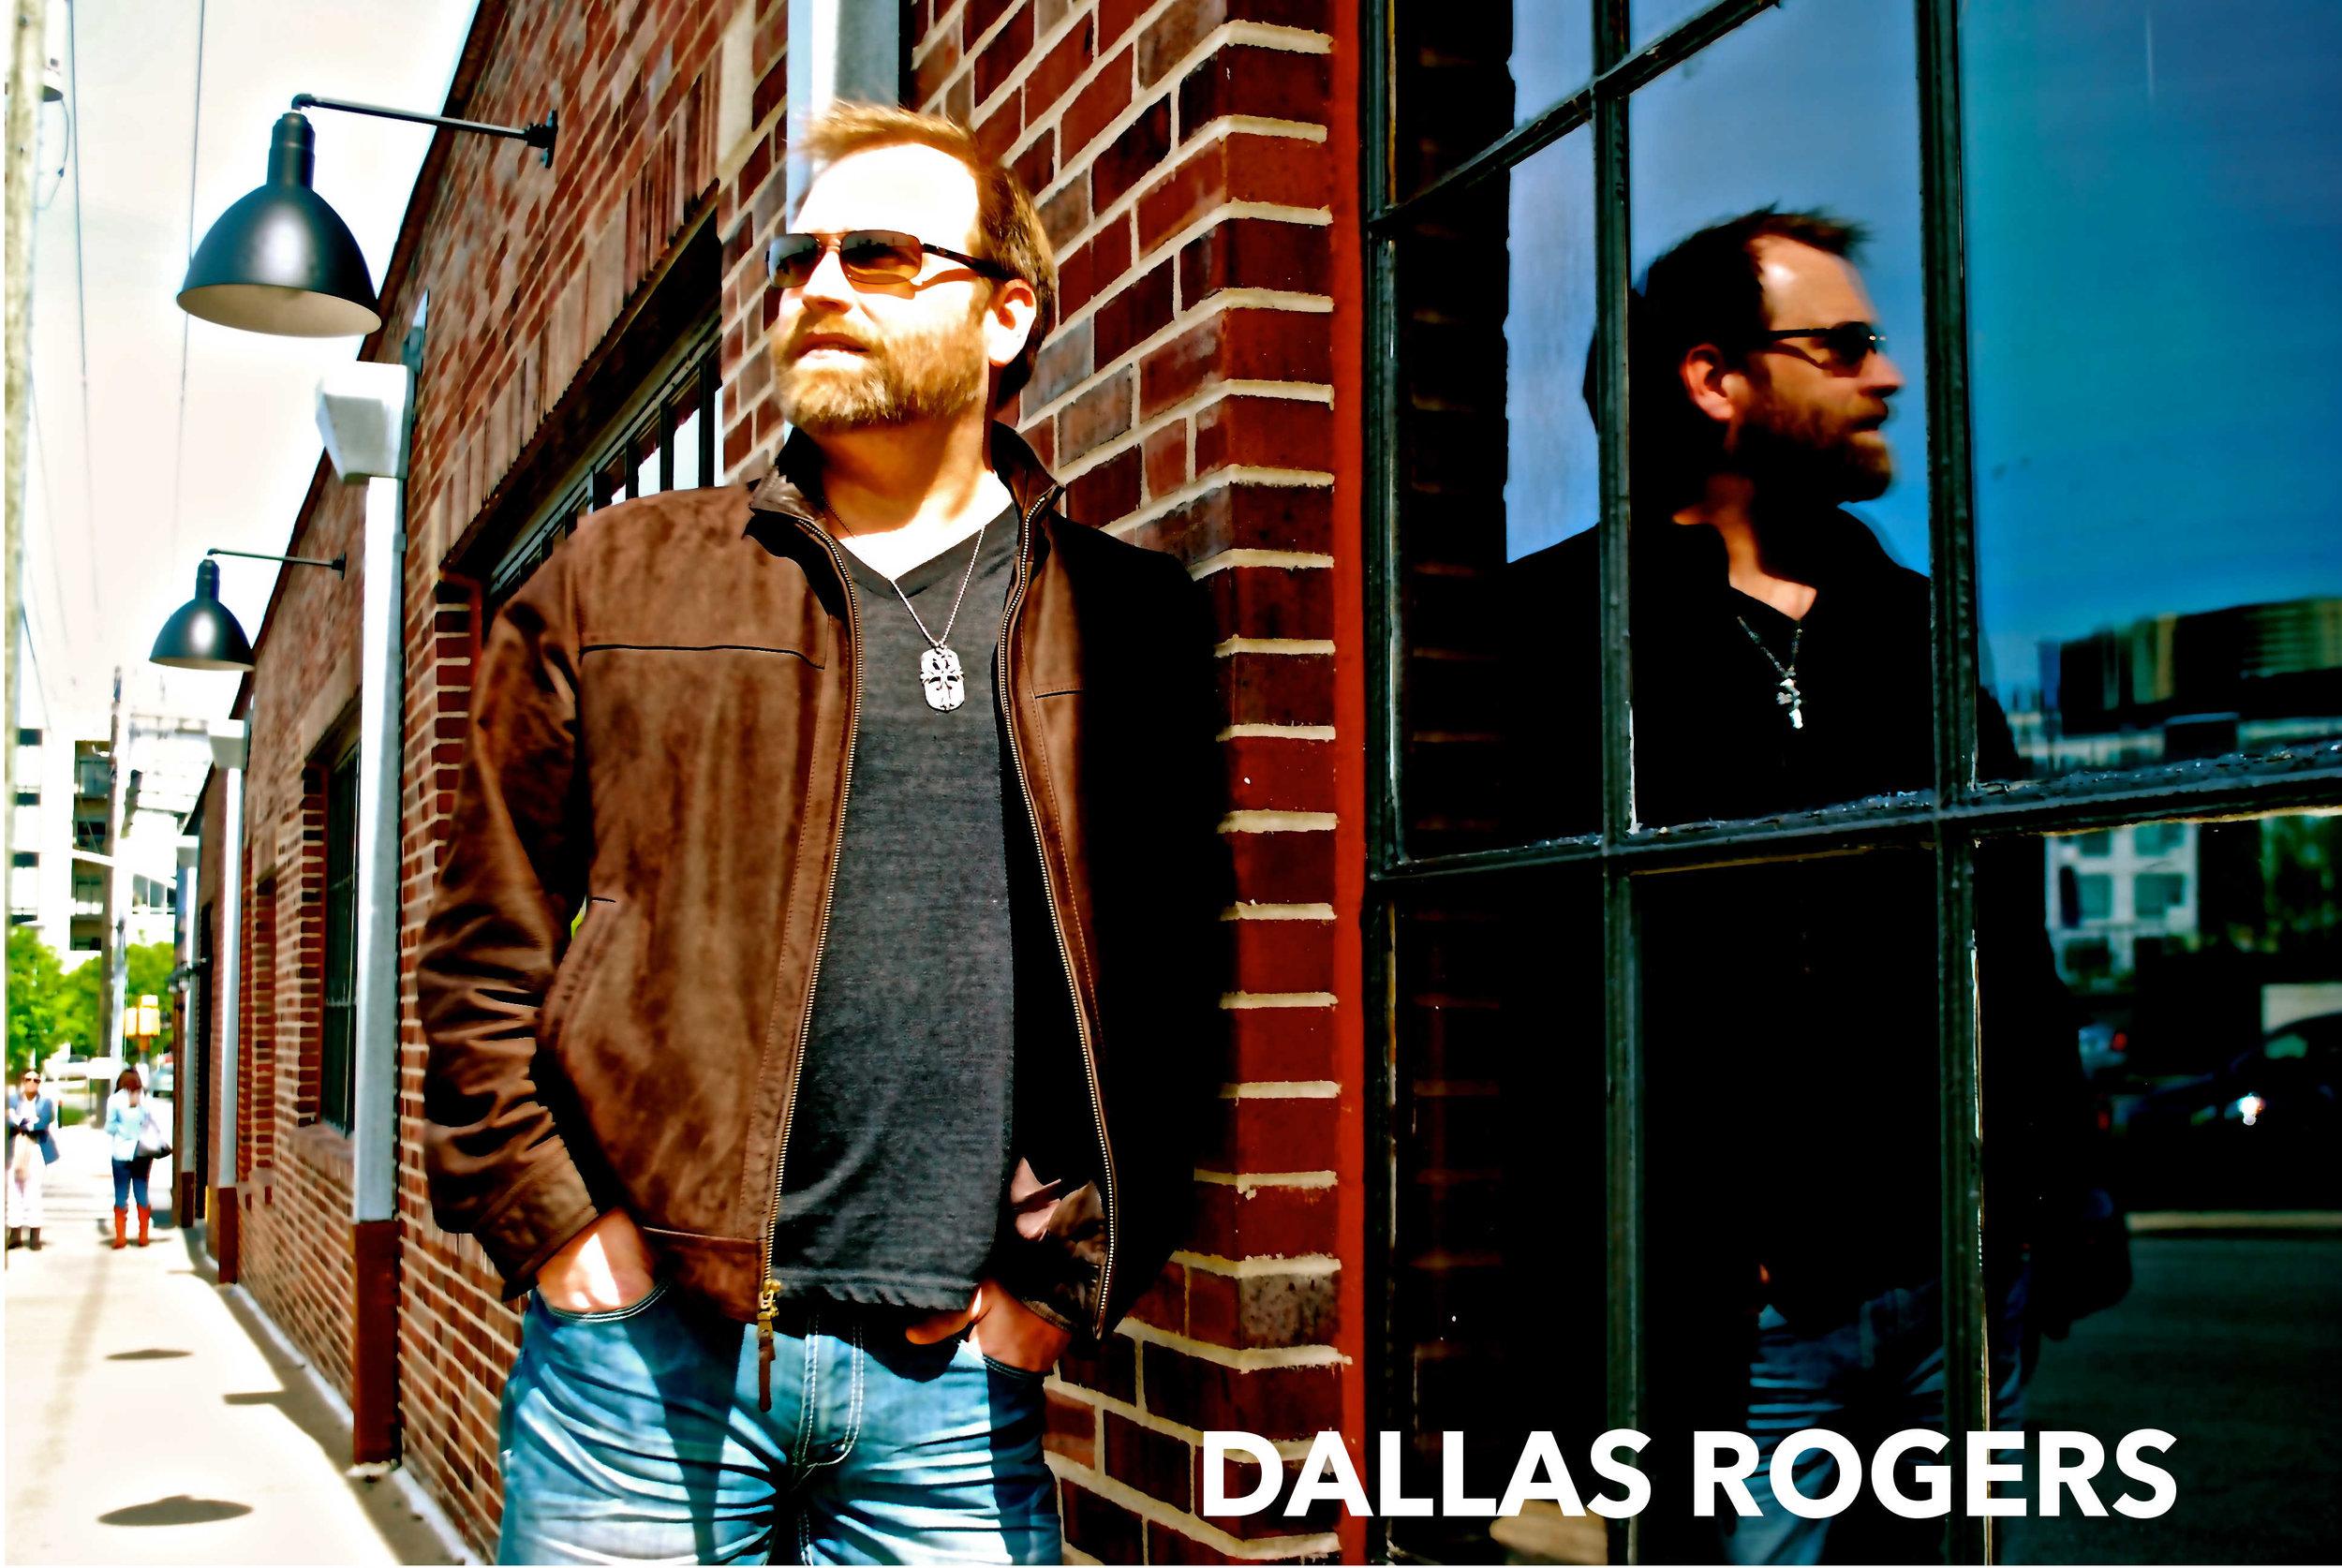 DallasRogers_WindowShot_Agcy.jpg